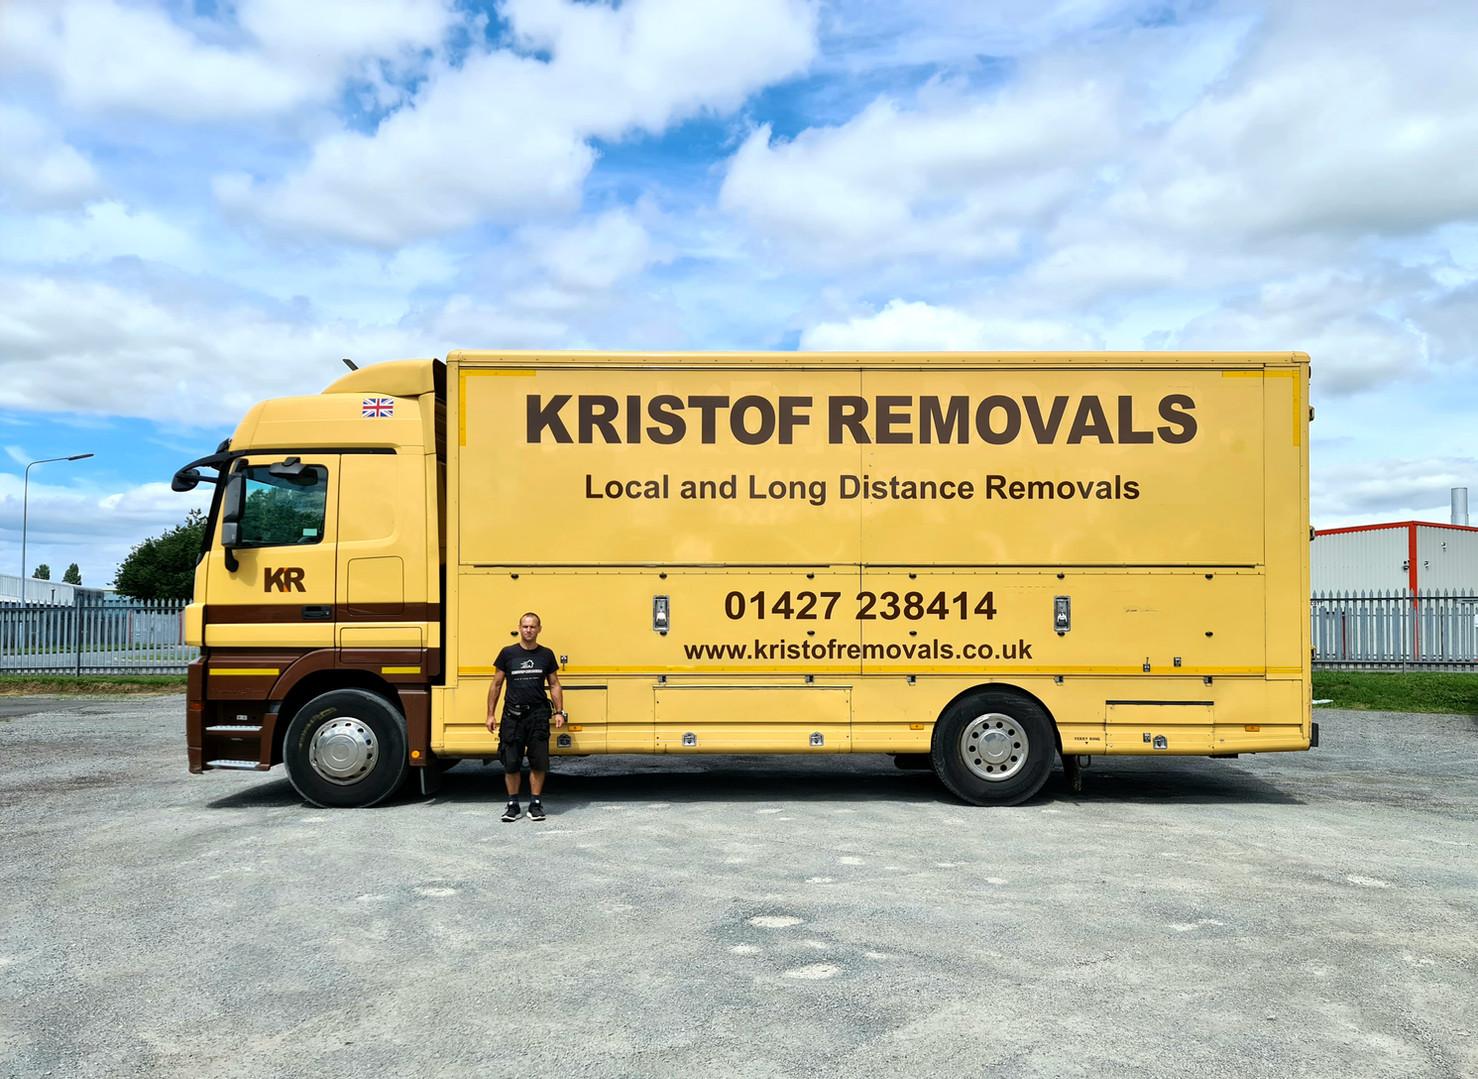 Kristof Removals 18t Lorry.jpg